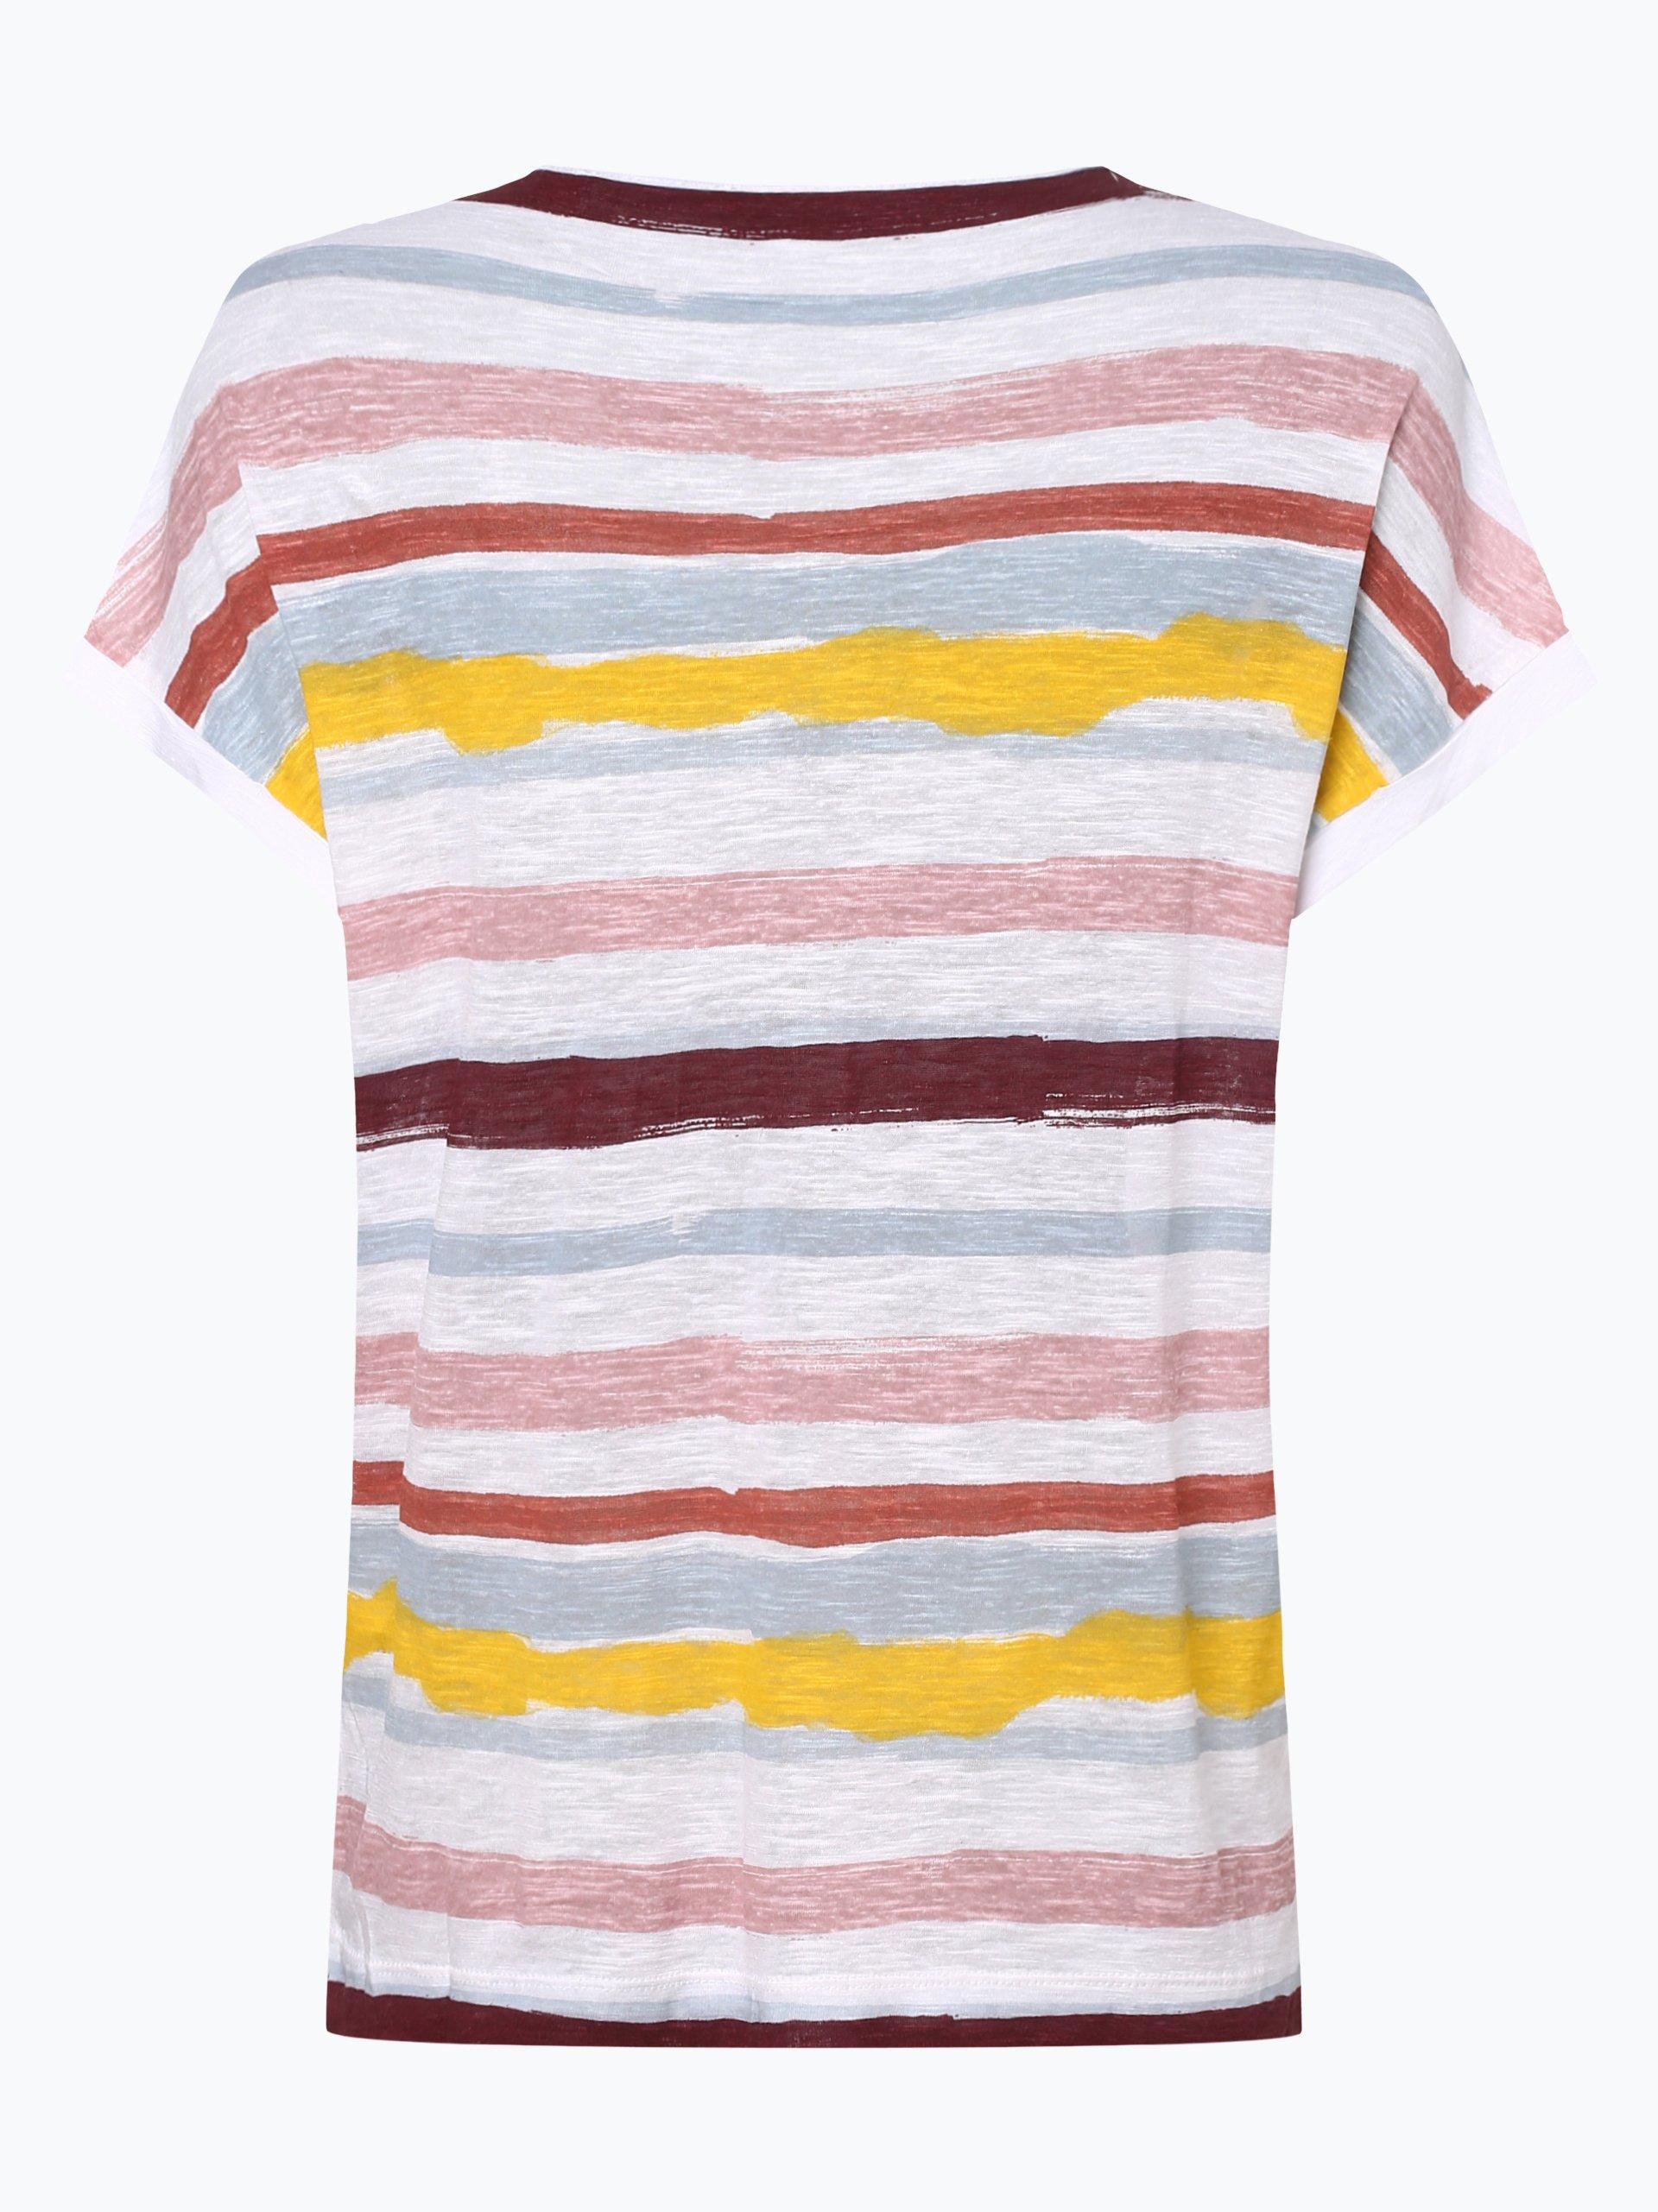 s.Oliver T-shirt damski z dodatkiem lnu